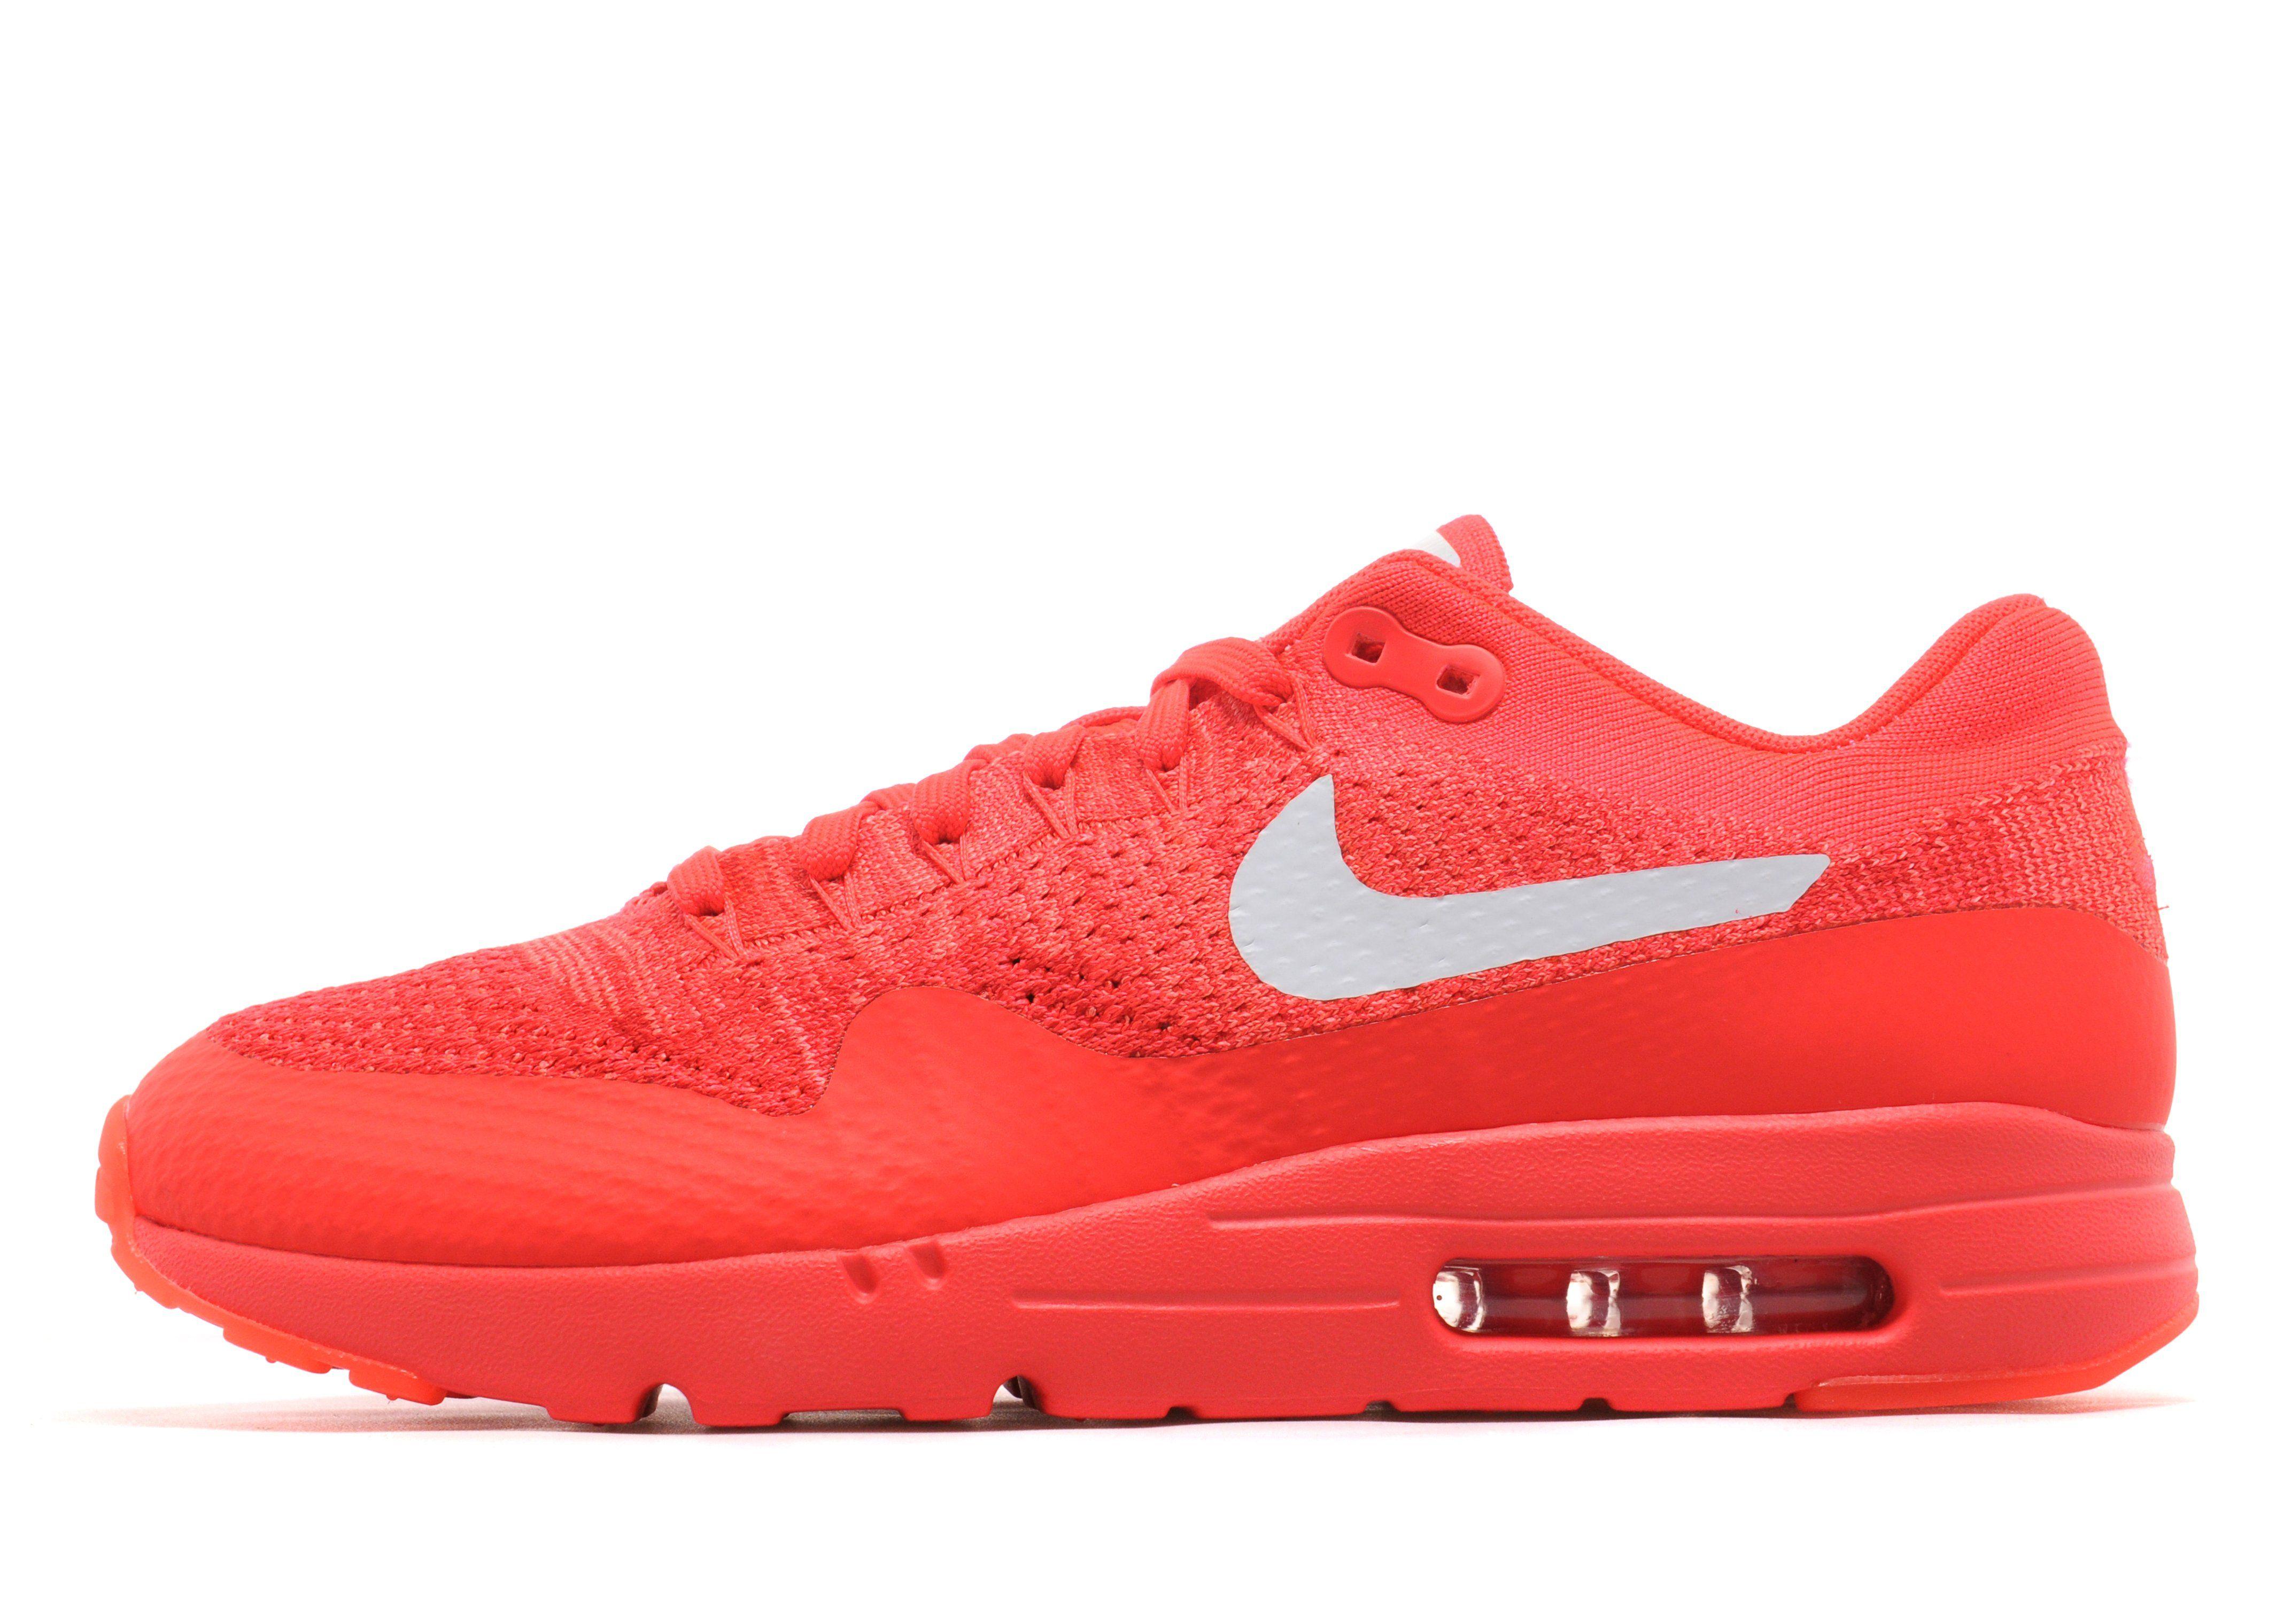 quality design 99a04 2d736 50%OFF Nike Air Max 1 Flyknit   JD Sports